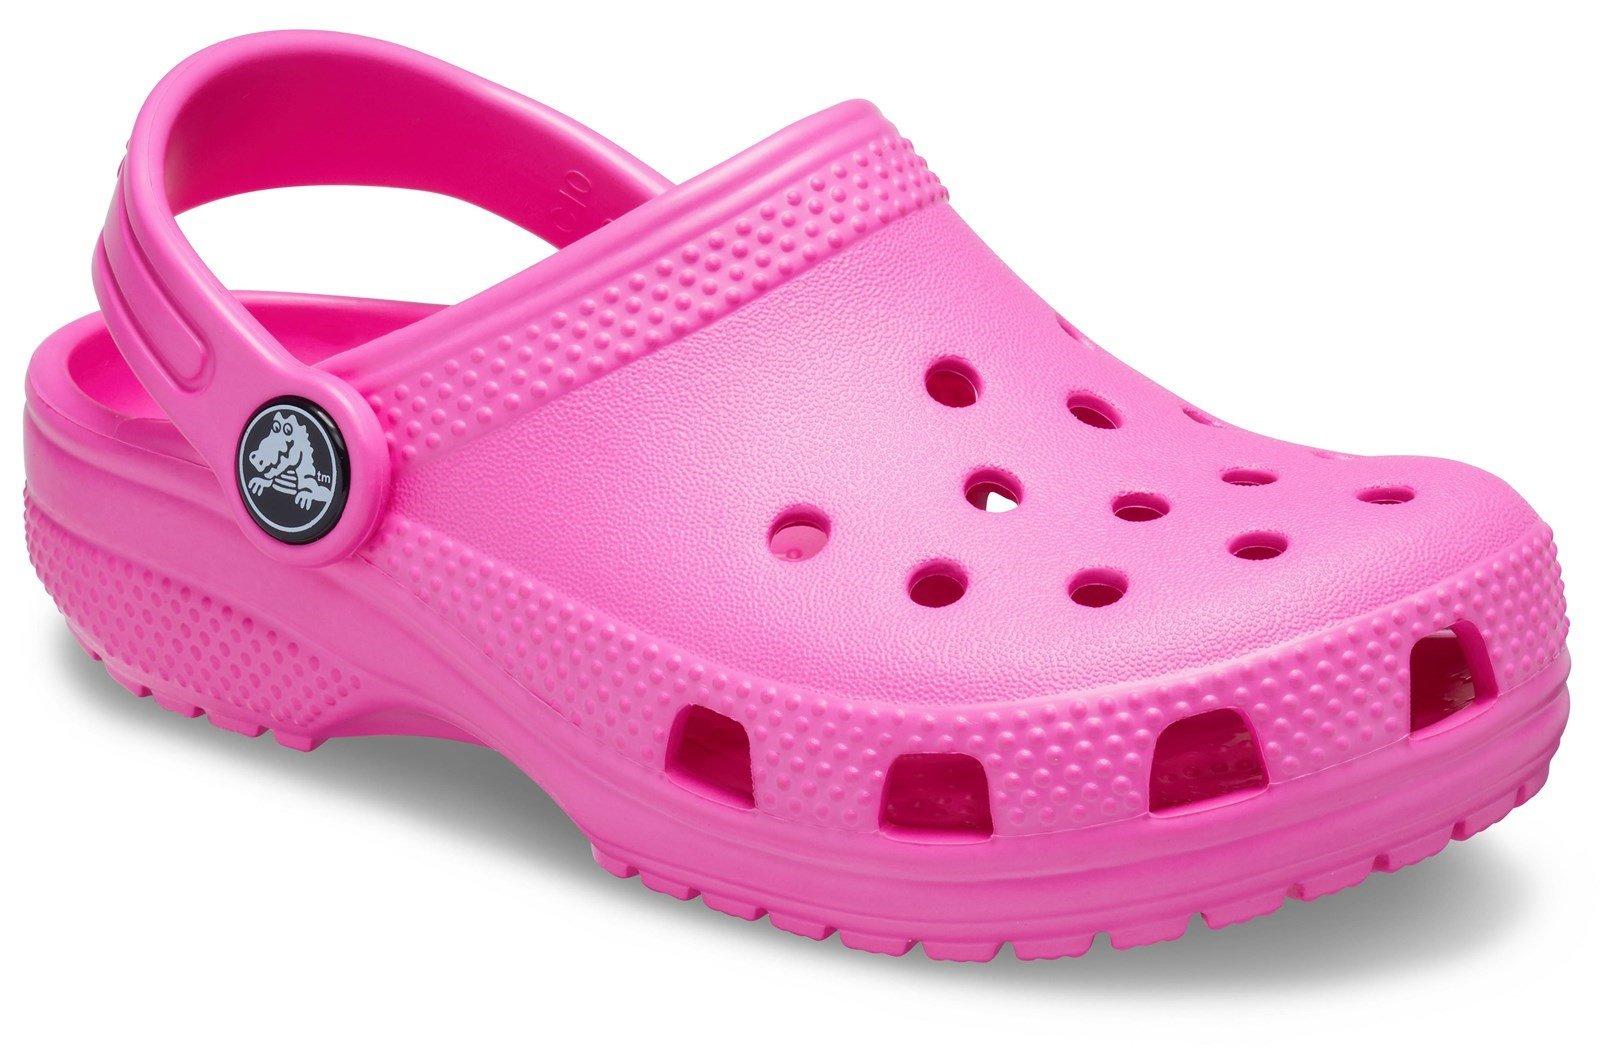 Crocs Kid's Classic Slip On Clog Sandal Various Colours 31493 - Electric Pink 4